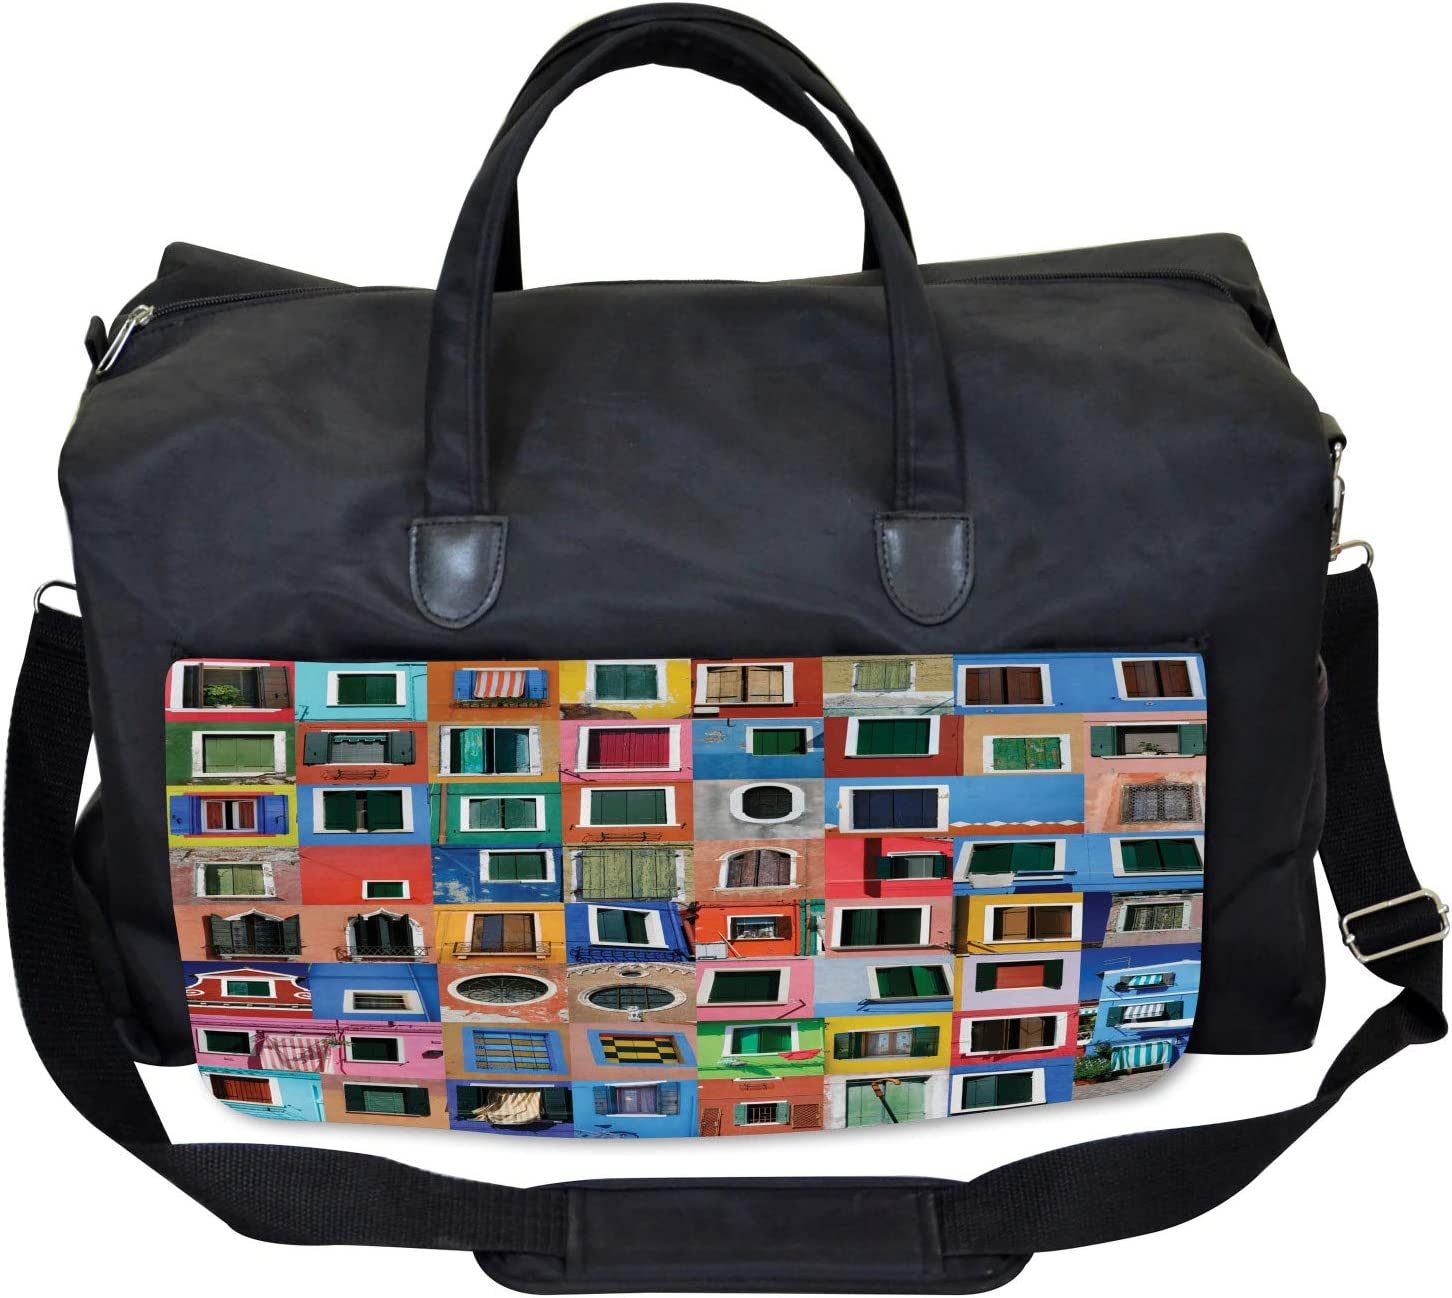 Large Weekender Carry-on Mediterranean Village Ambesonne Colorful Gym Bag